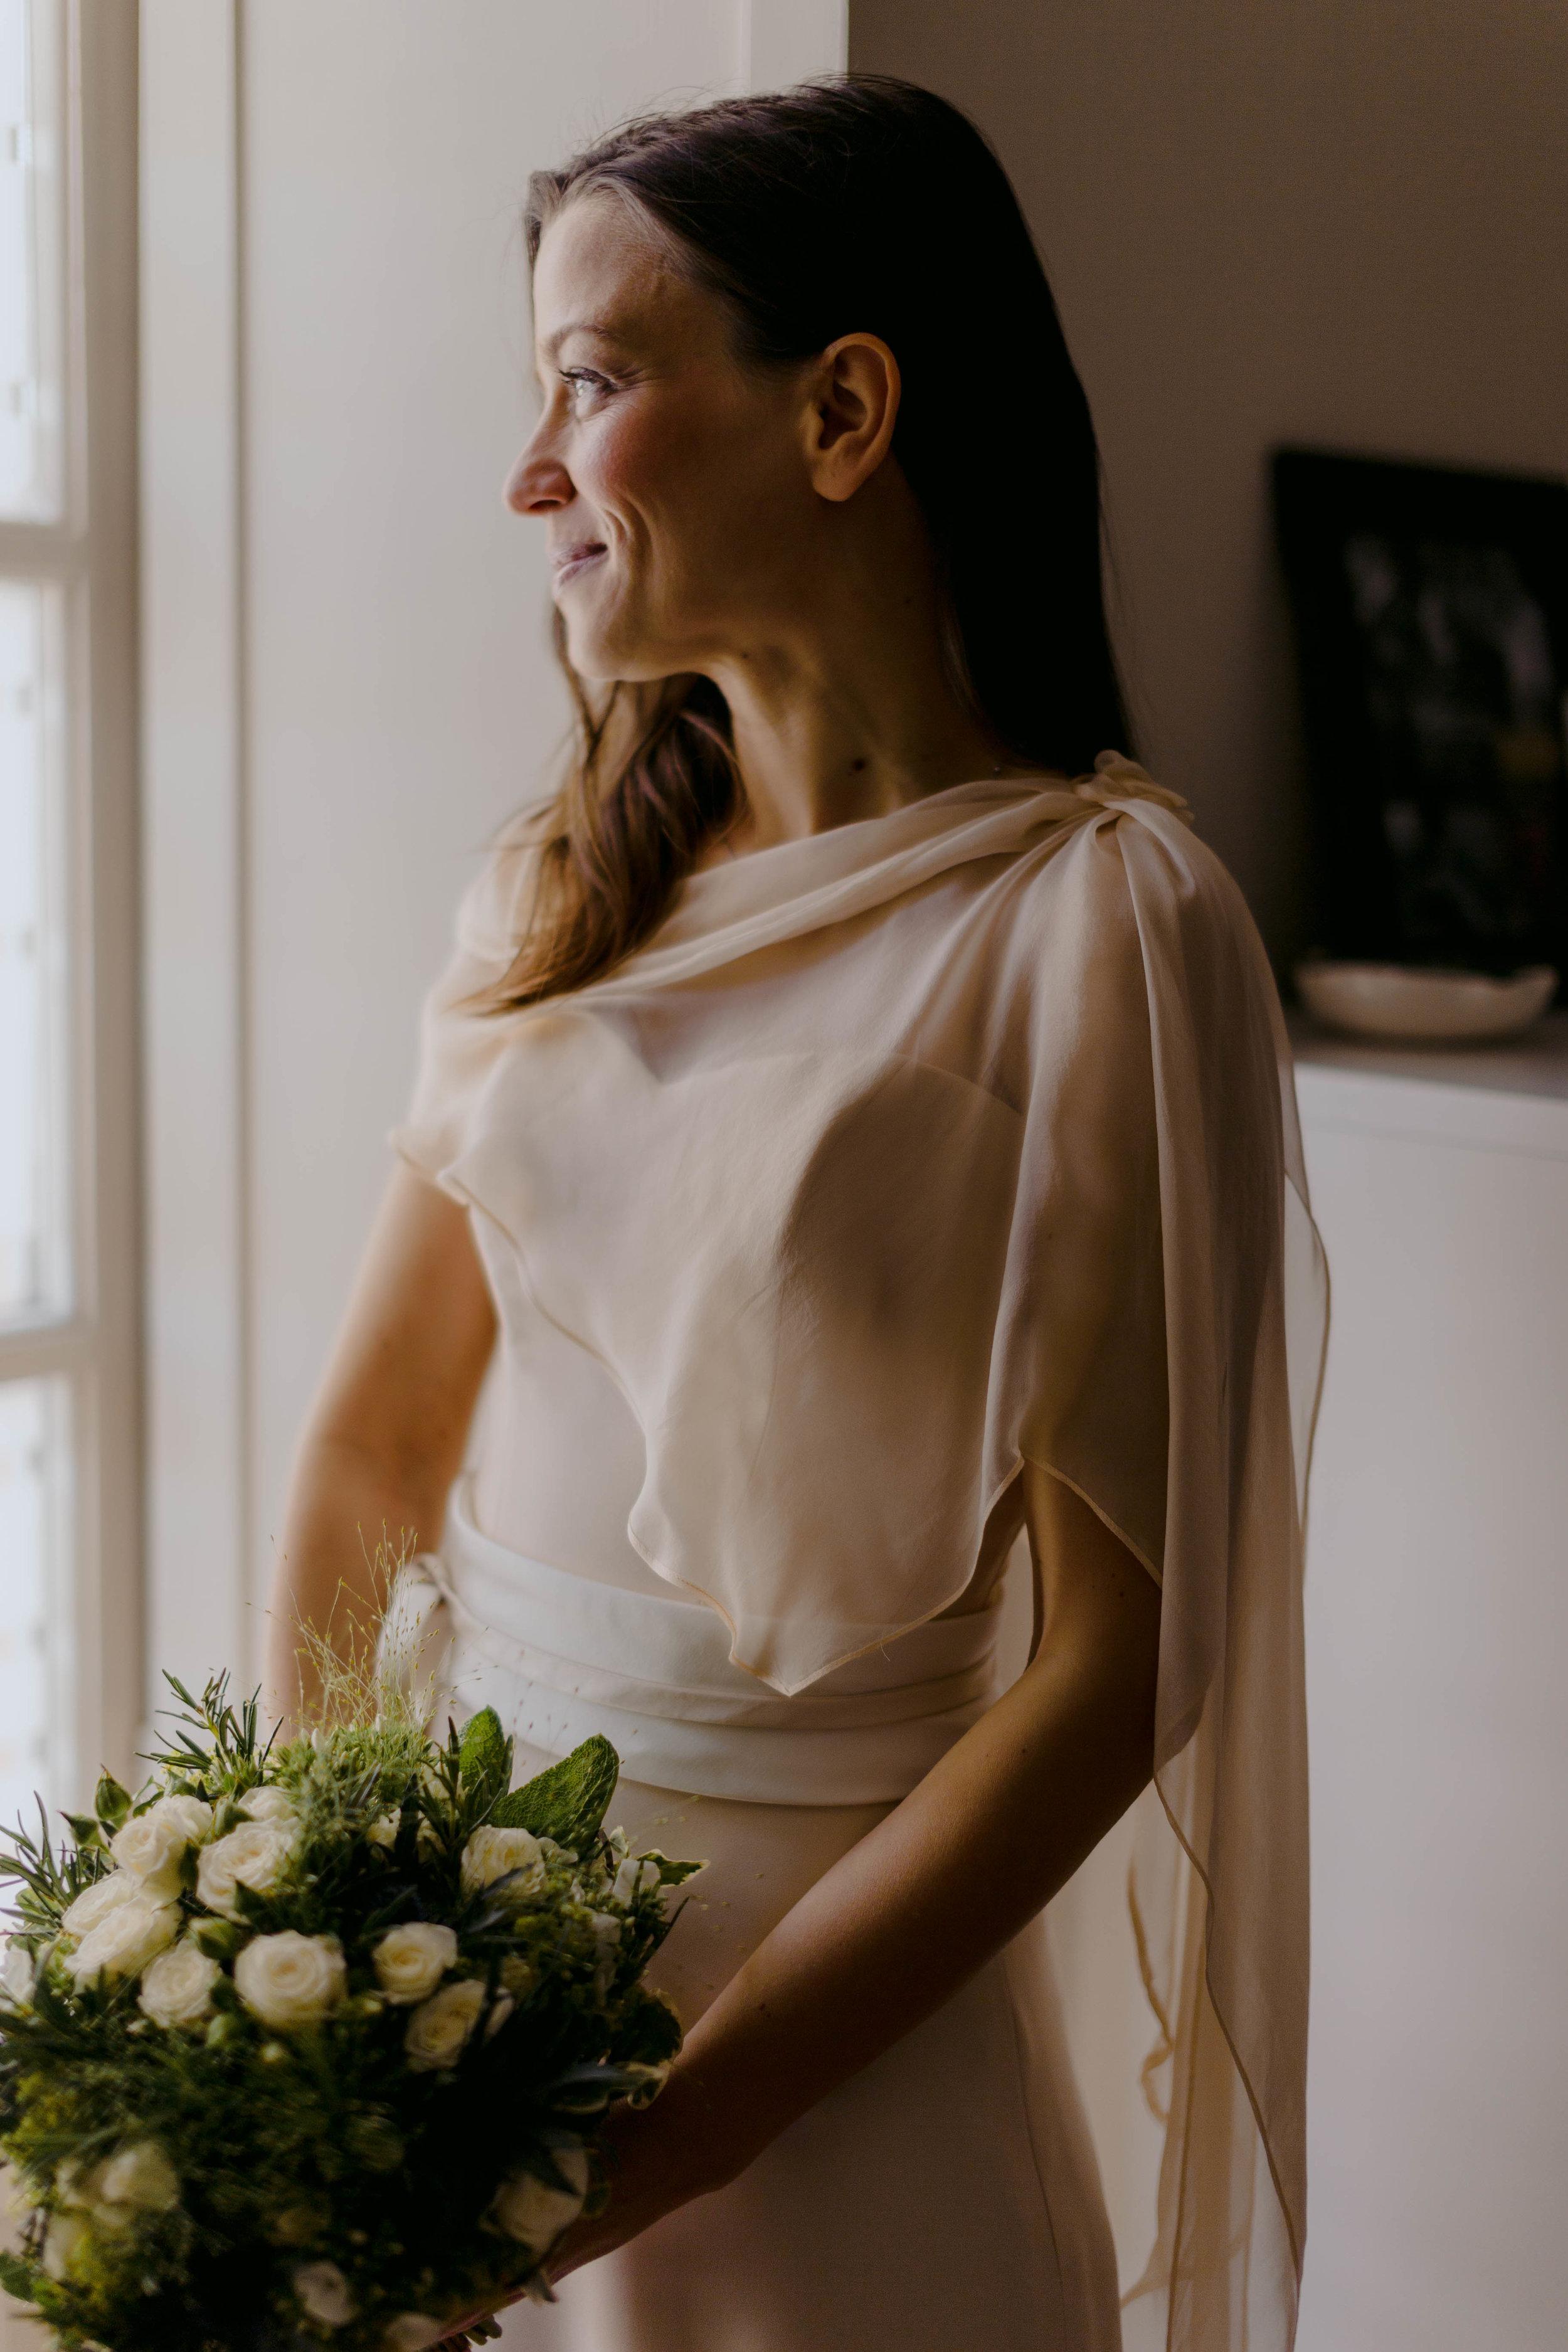 100 - Preparazione sposi.jpg